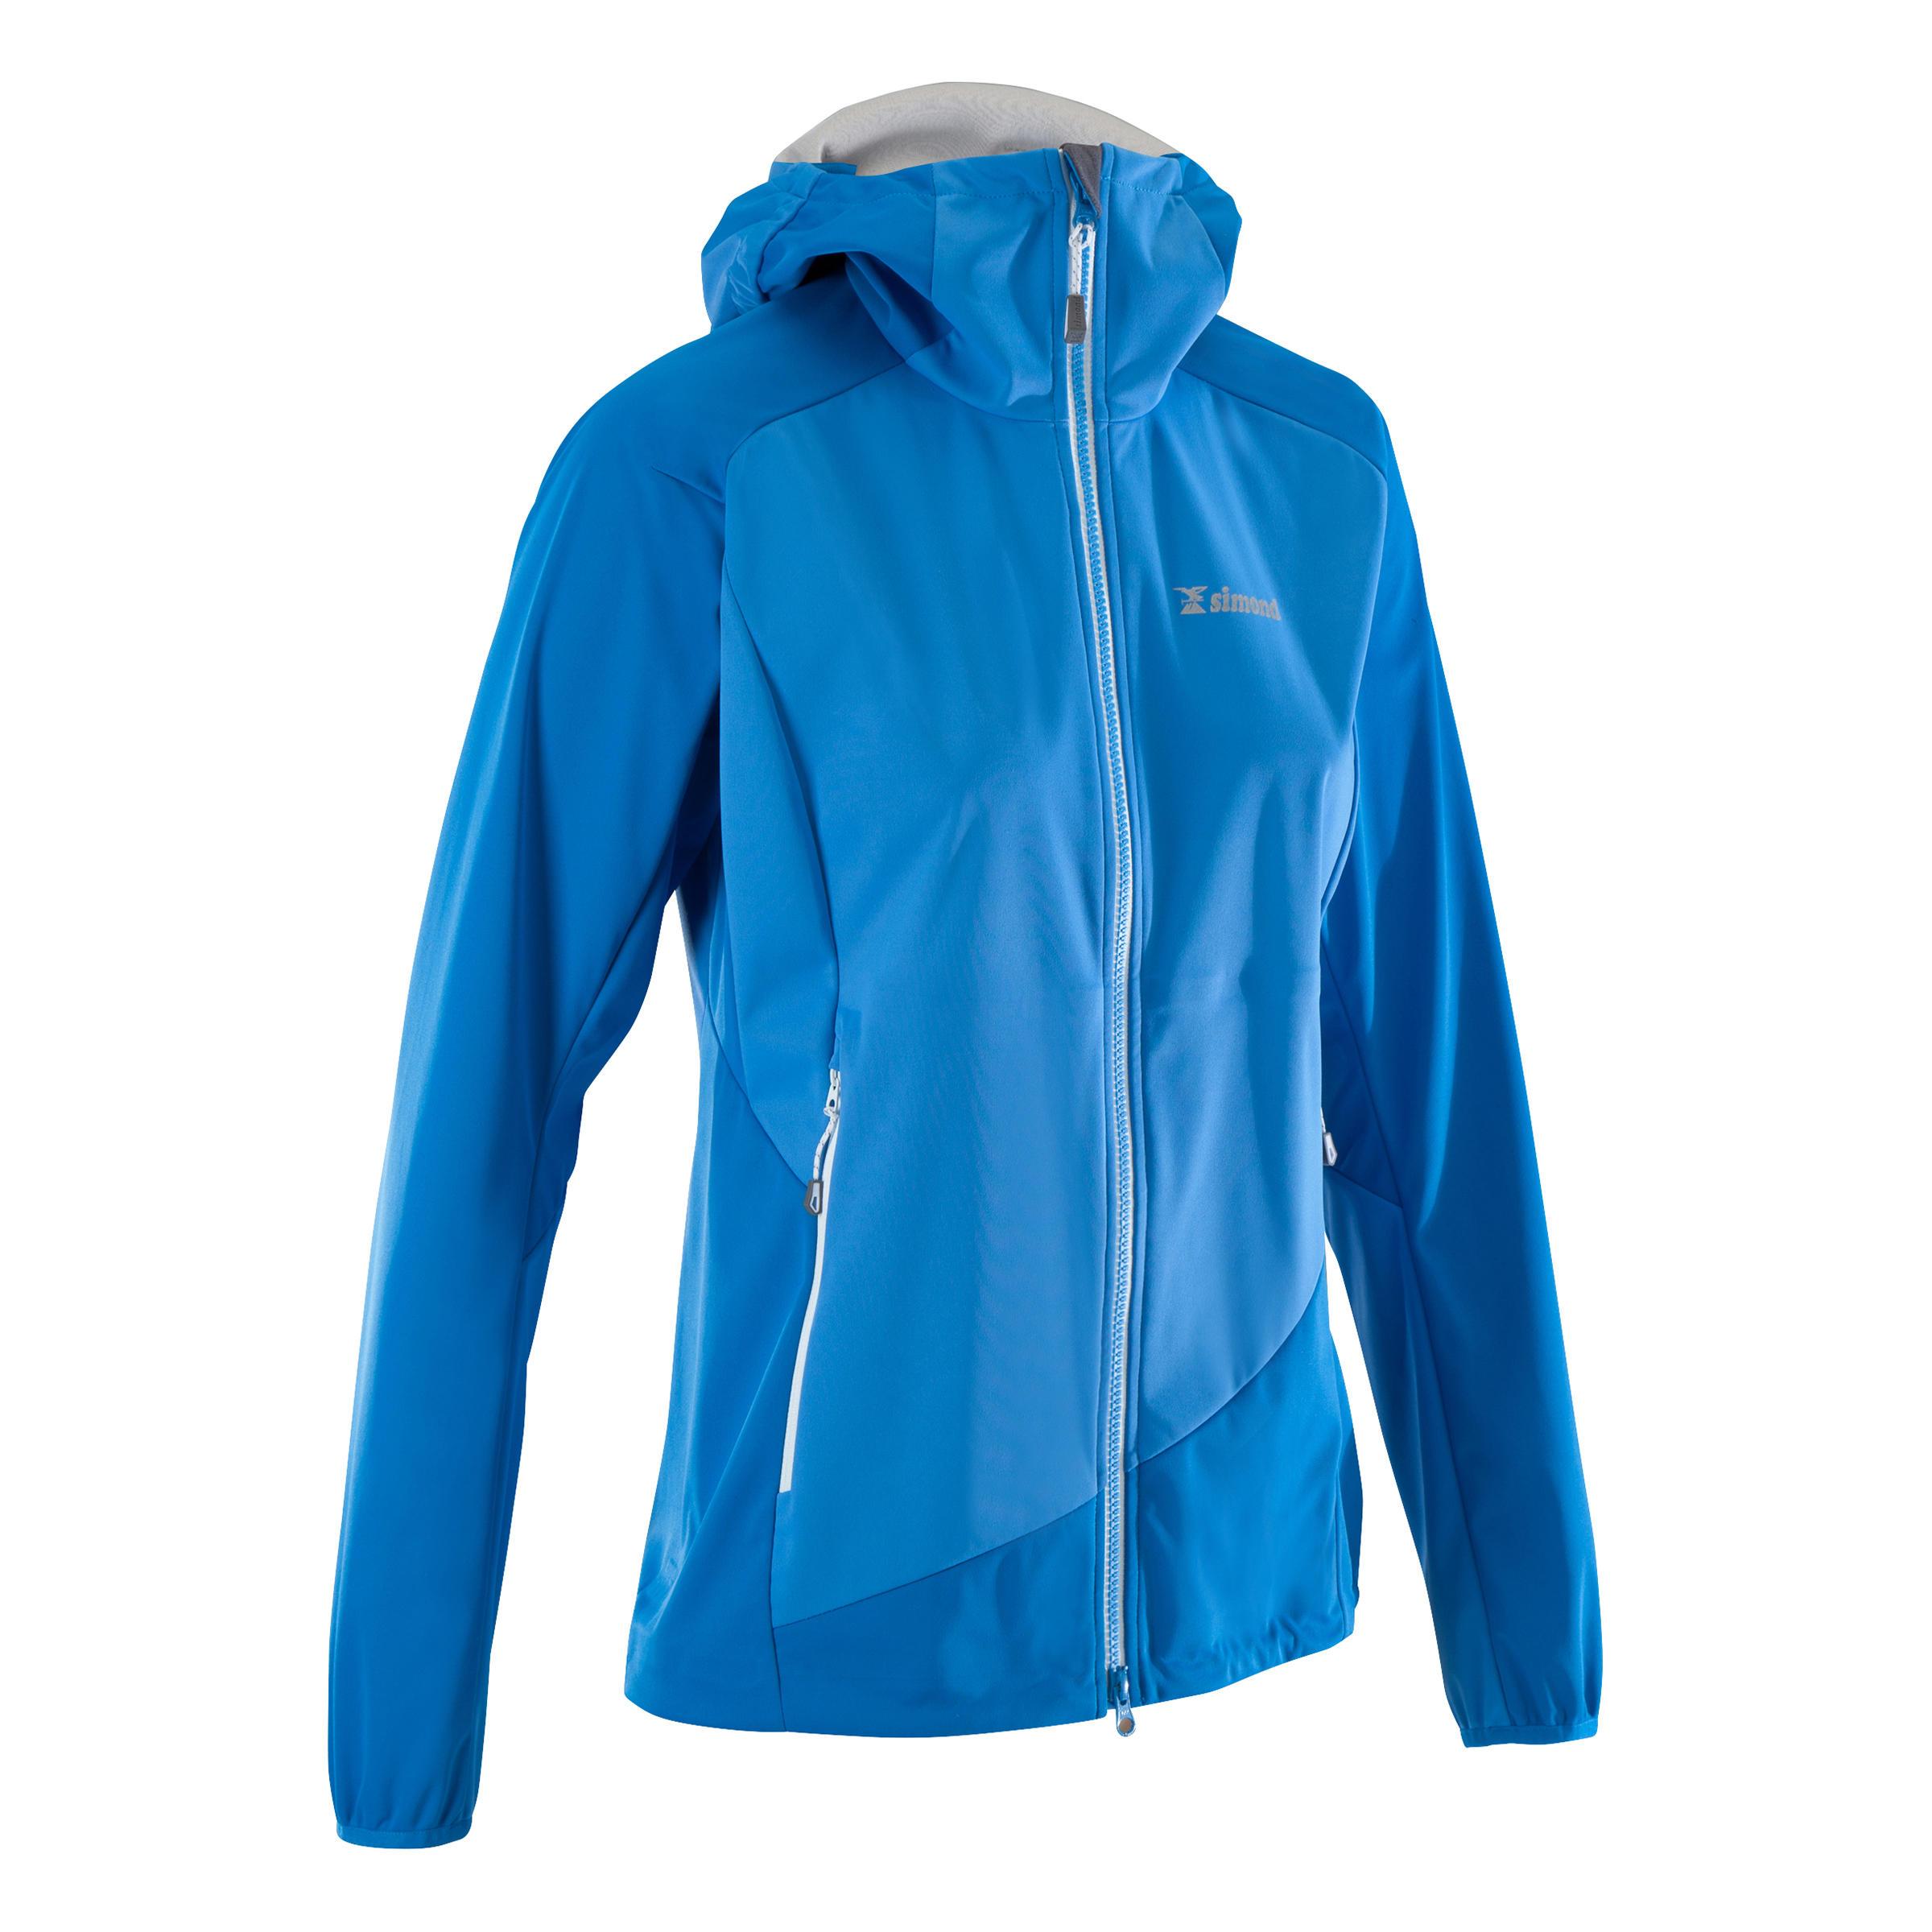 Jachetă Softshell Light Damă imagine